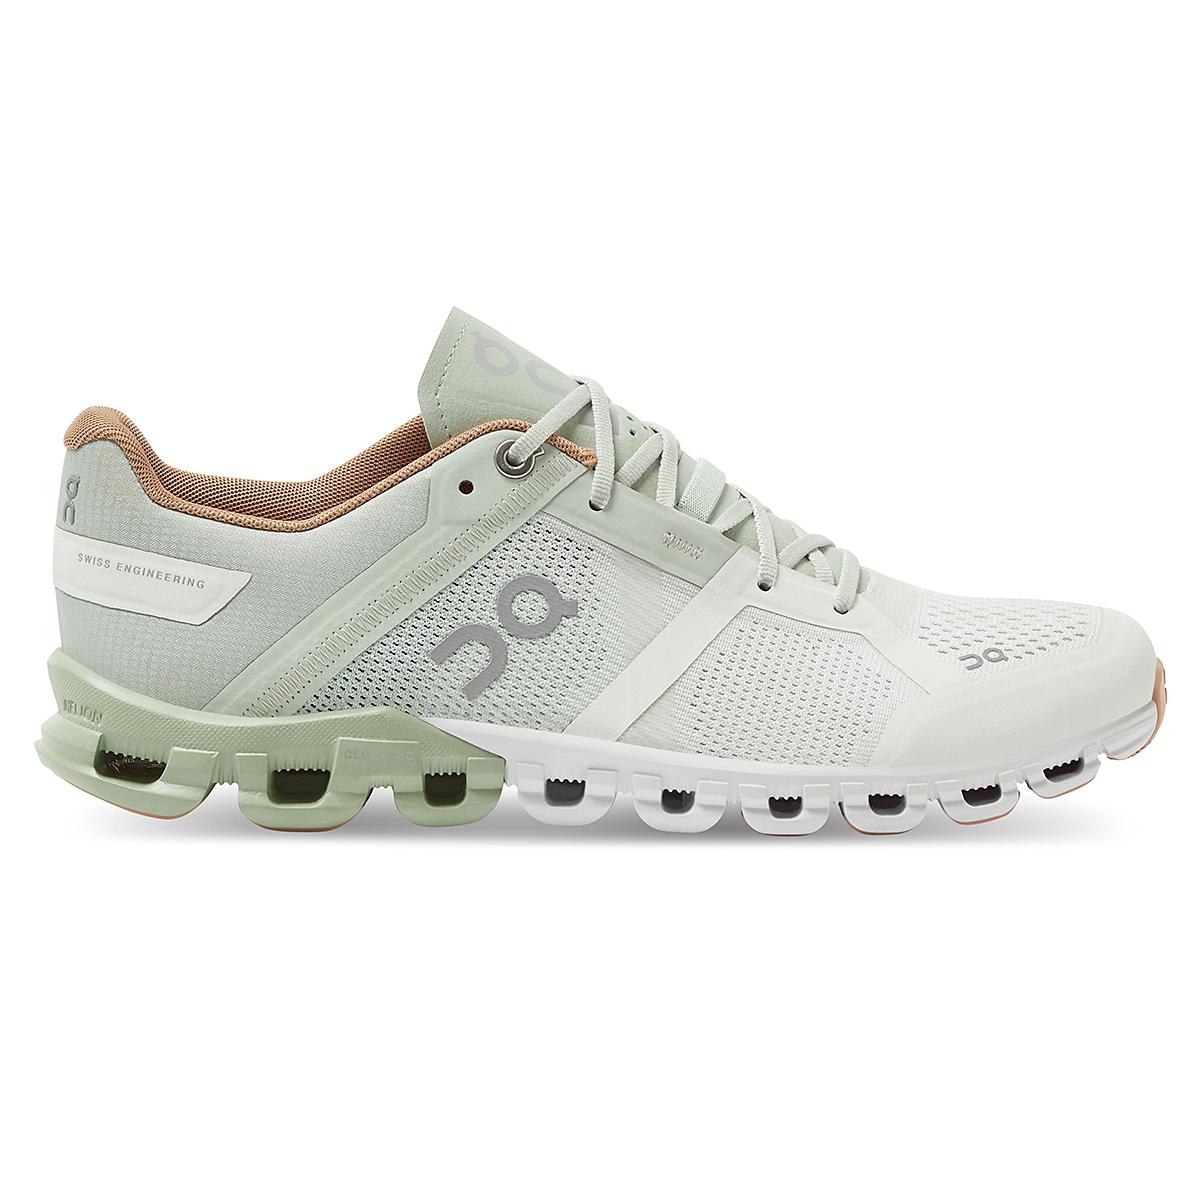 Women's On Cloudflow 2.0 Running Shoe - Color: Aloe/White - Size: 5 - Width: Regular, Aloe/White, large, image 1